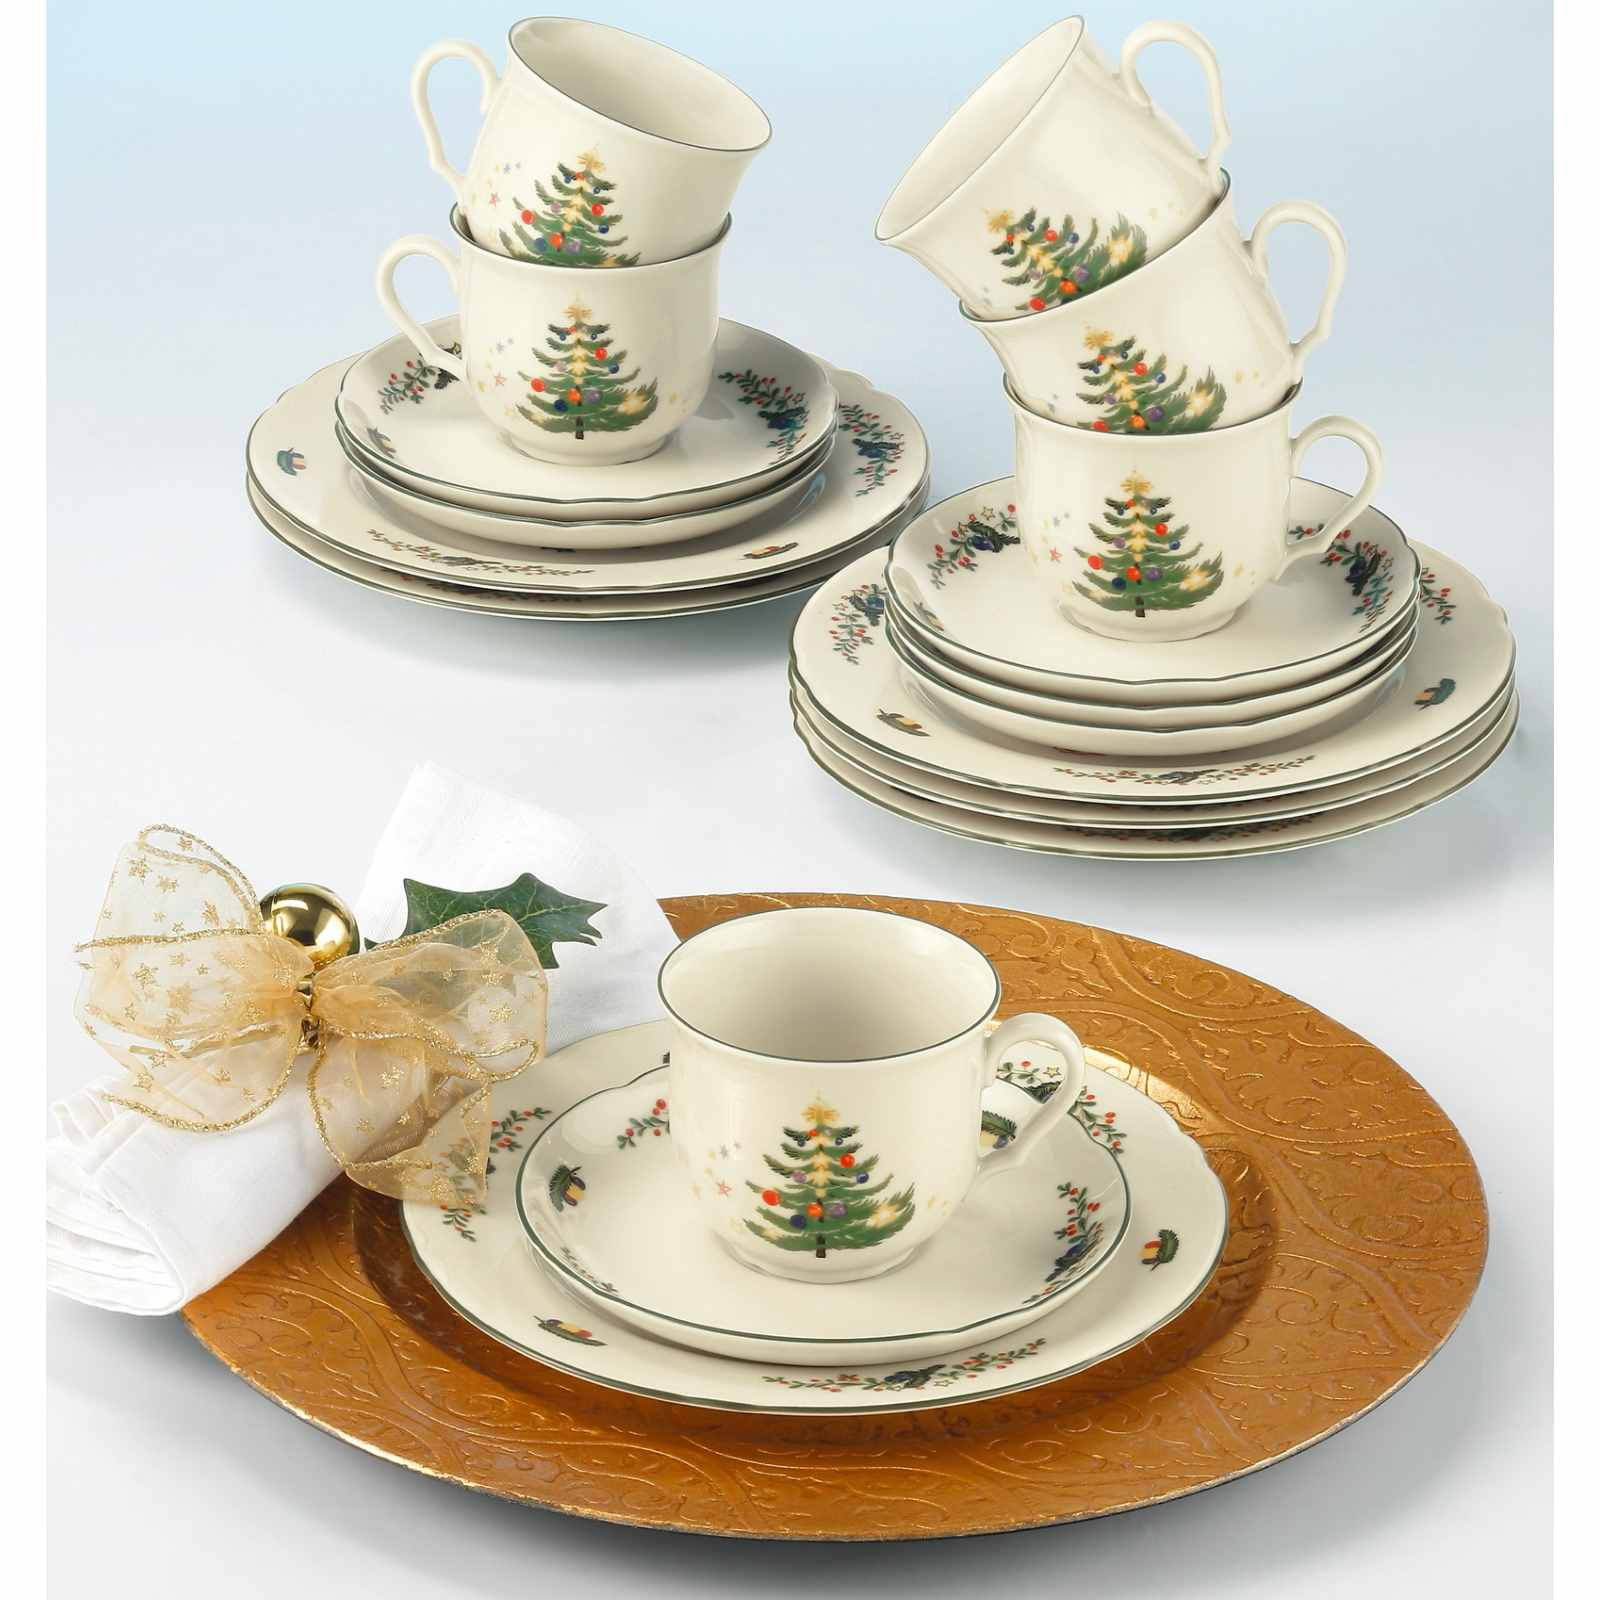 seltmann weiden marie luise weihnachten kaffeeservice 18. Black Bedroom Furniture Sets. Home Design Ideas